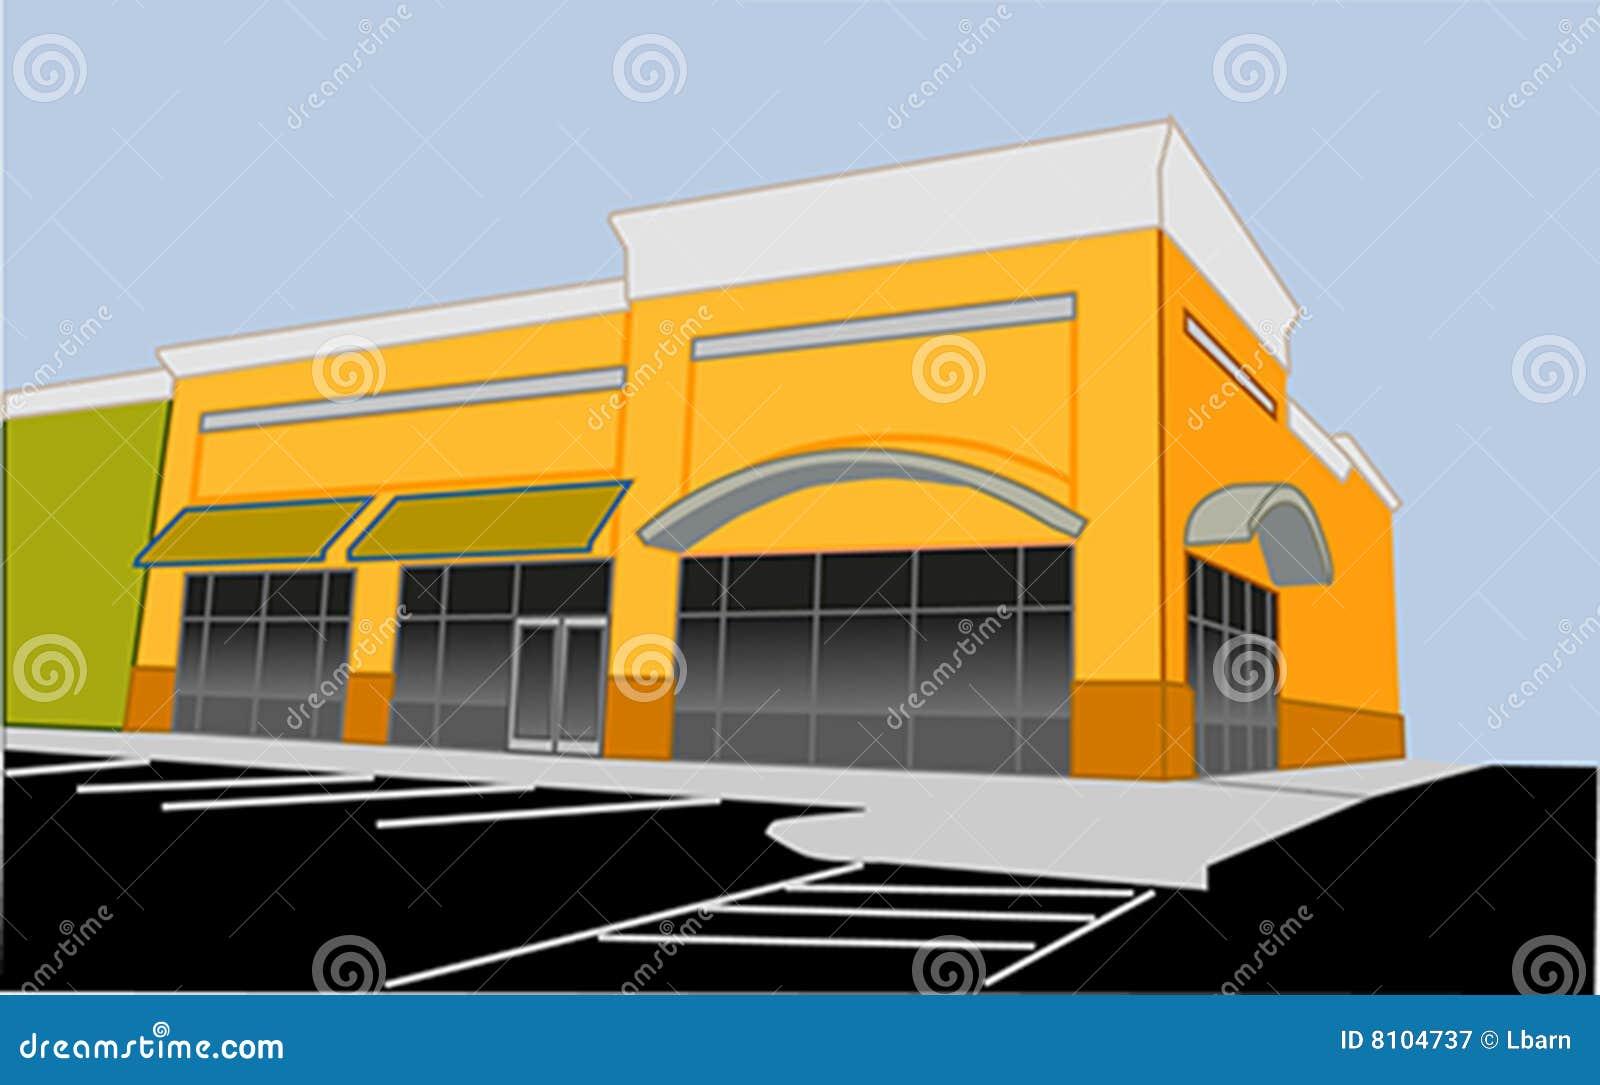 retail store clip art free - photo #29